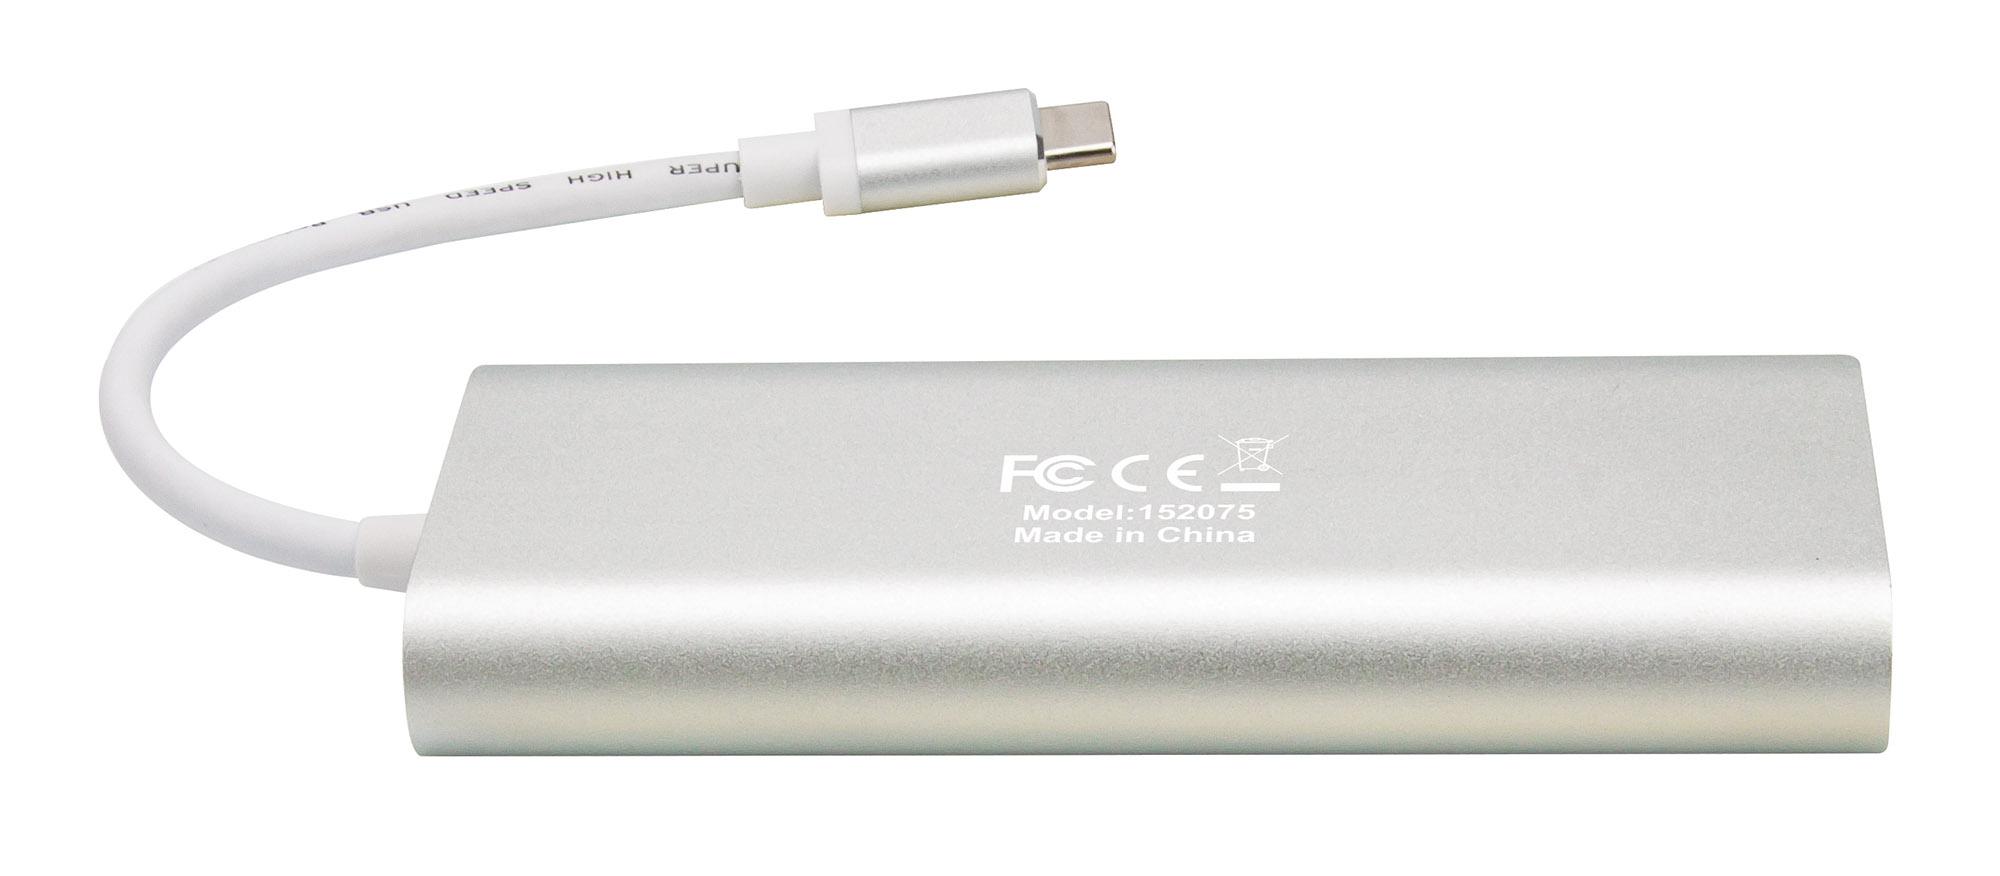 SuperSpeed USB-C Multiport Adapter